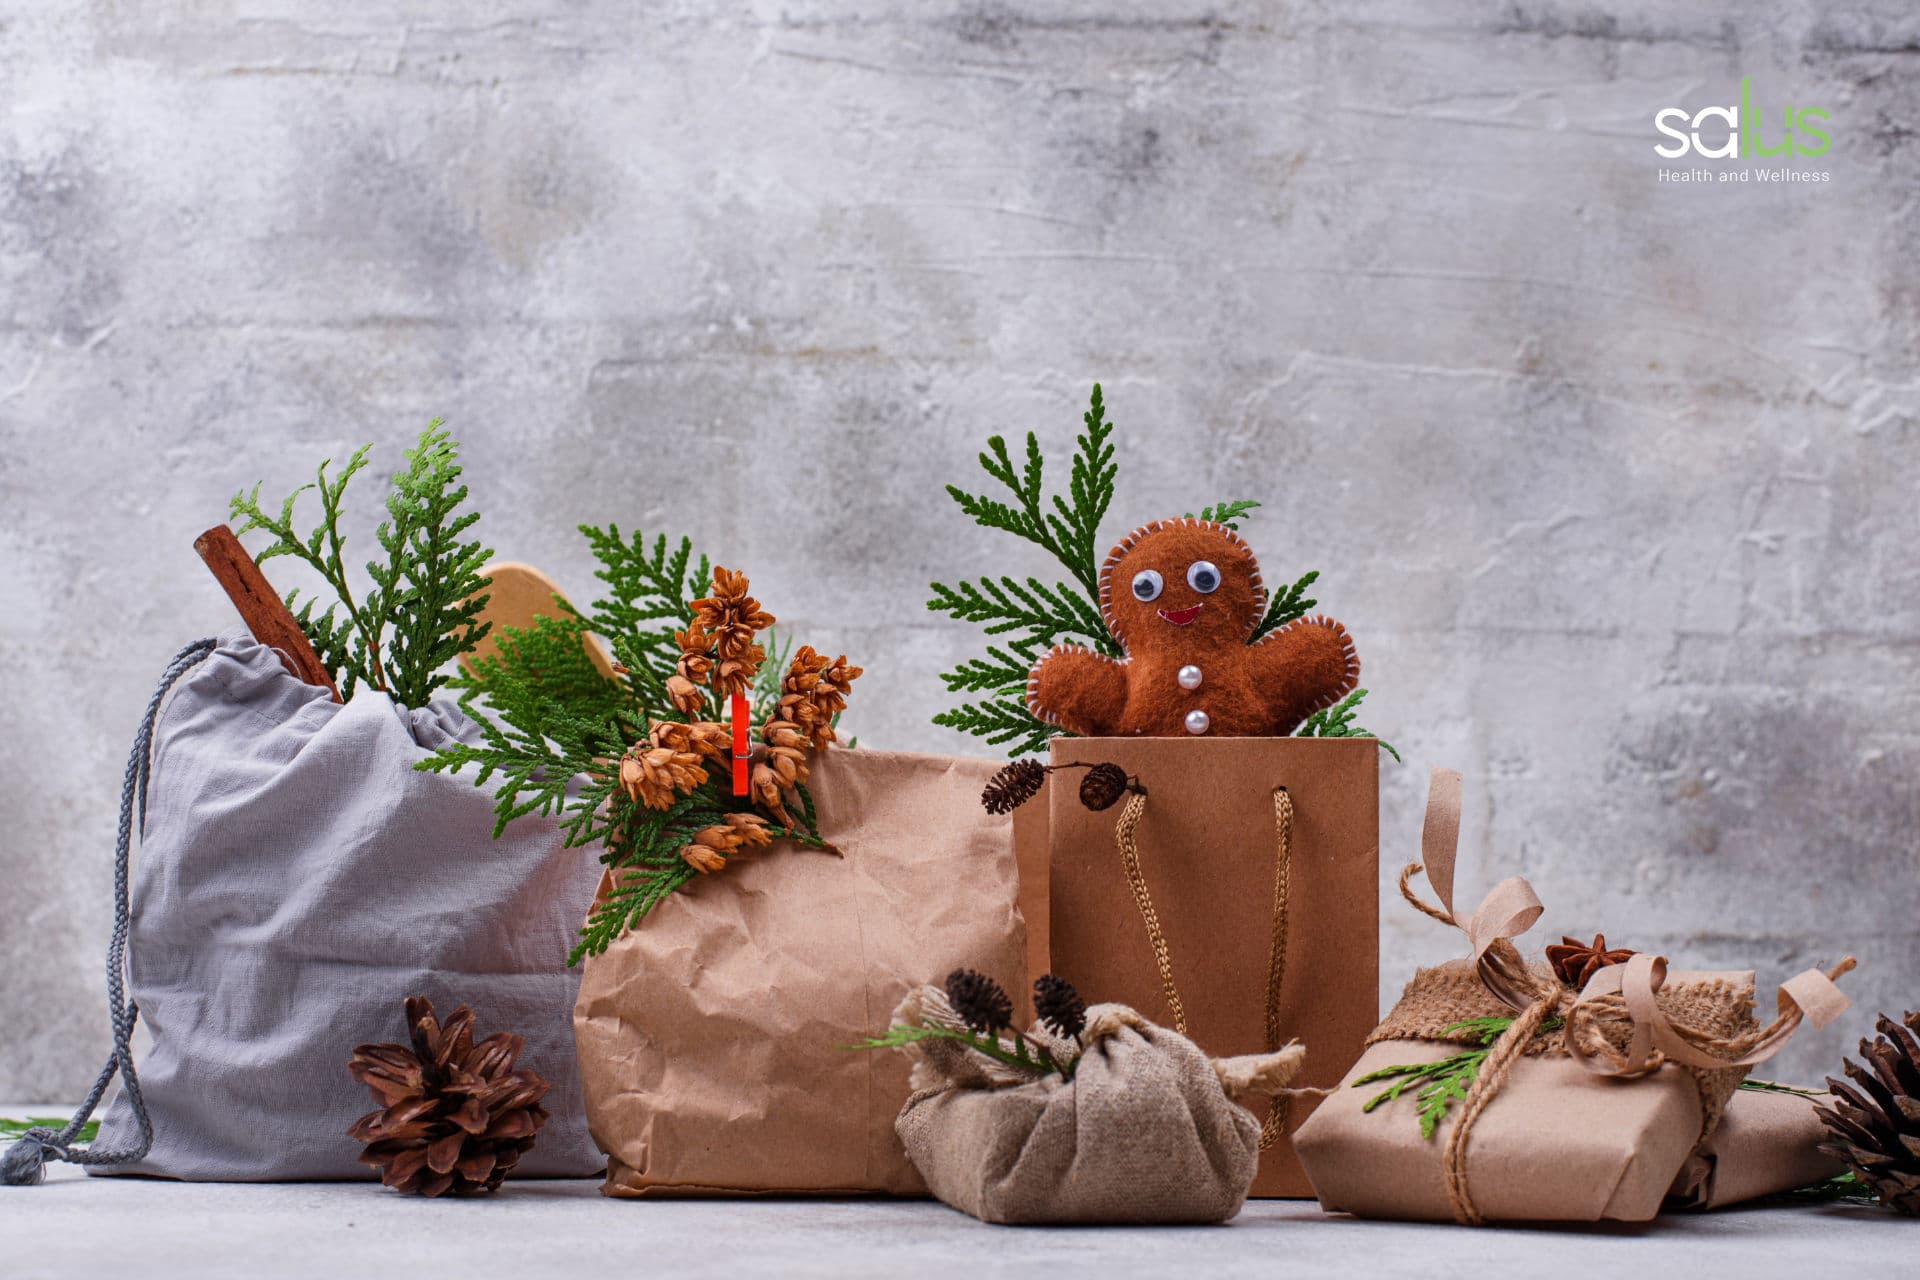 salus-blog-idee-regali-natale-2020-salute-benessere